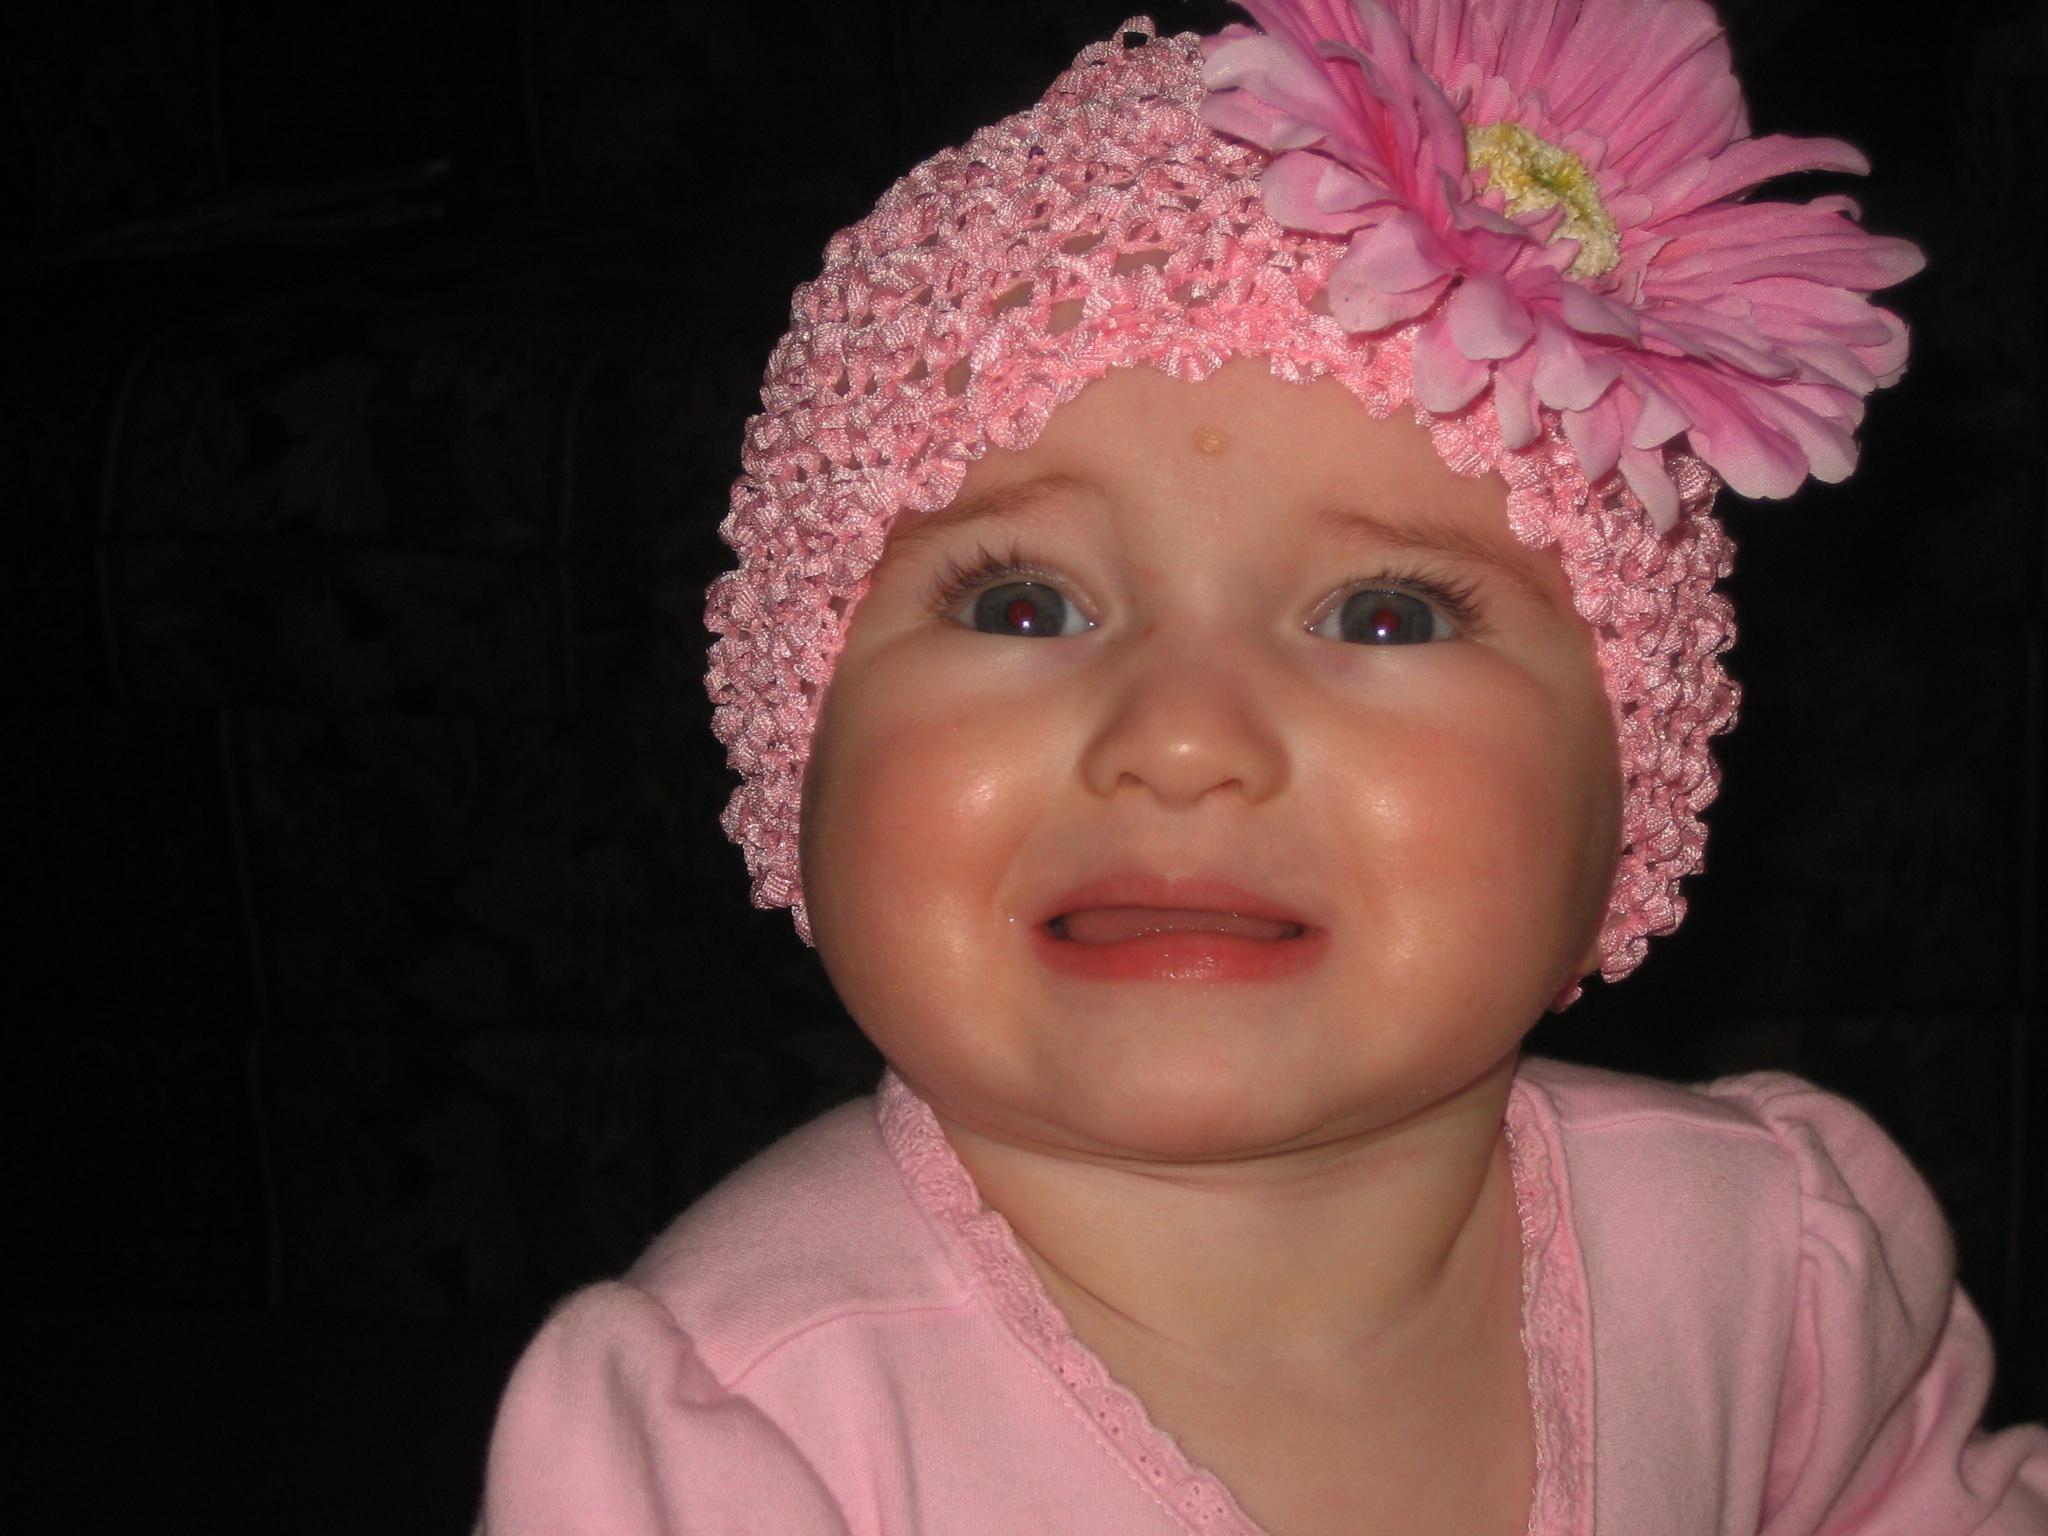 Emma at 6 months